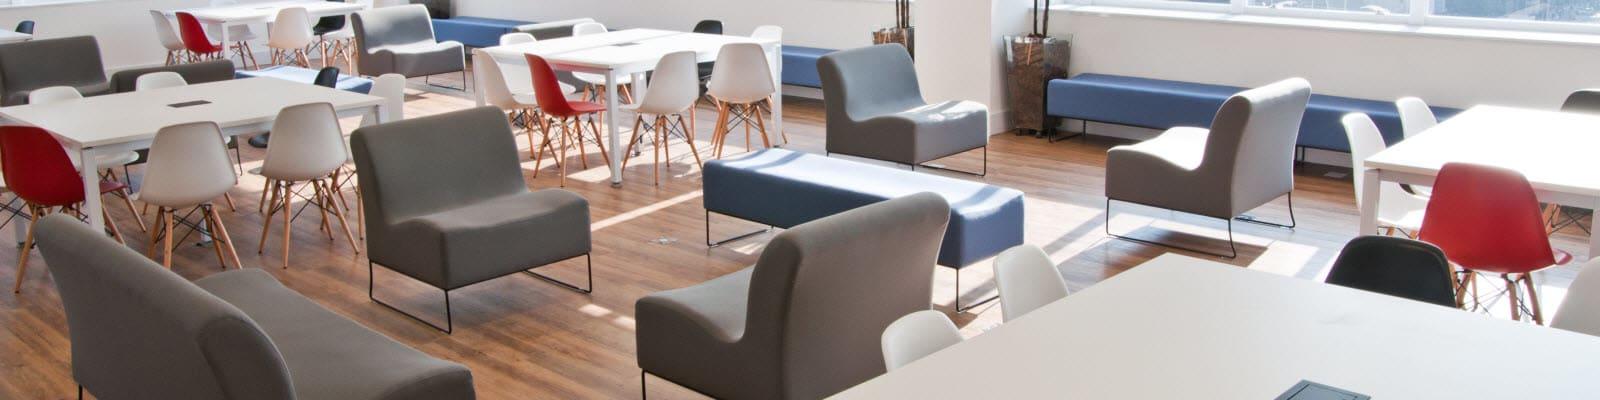 Working space furniture